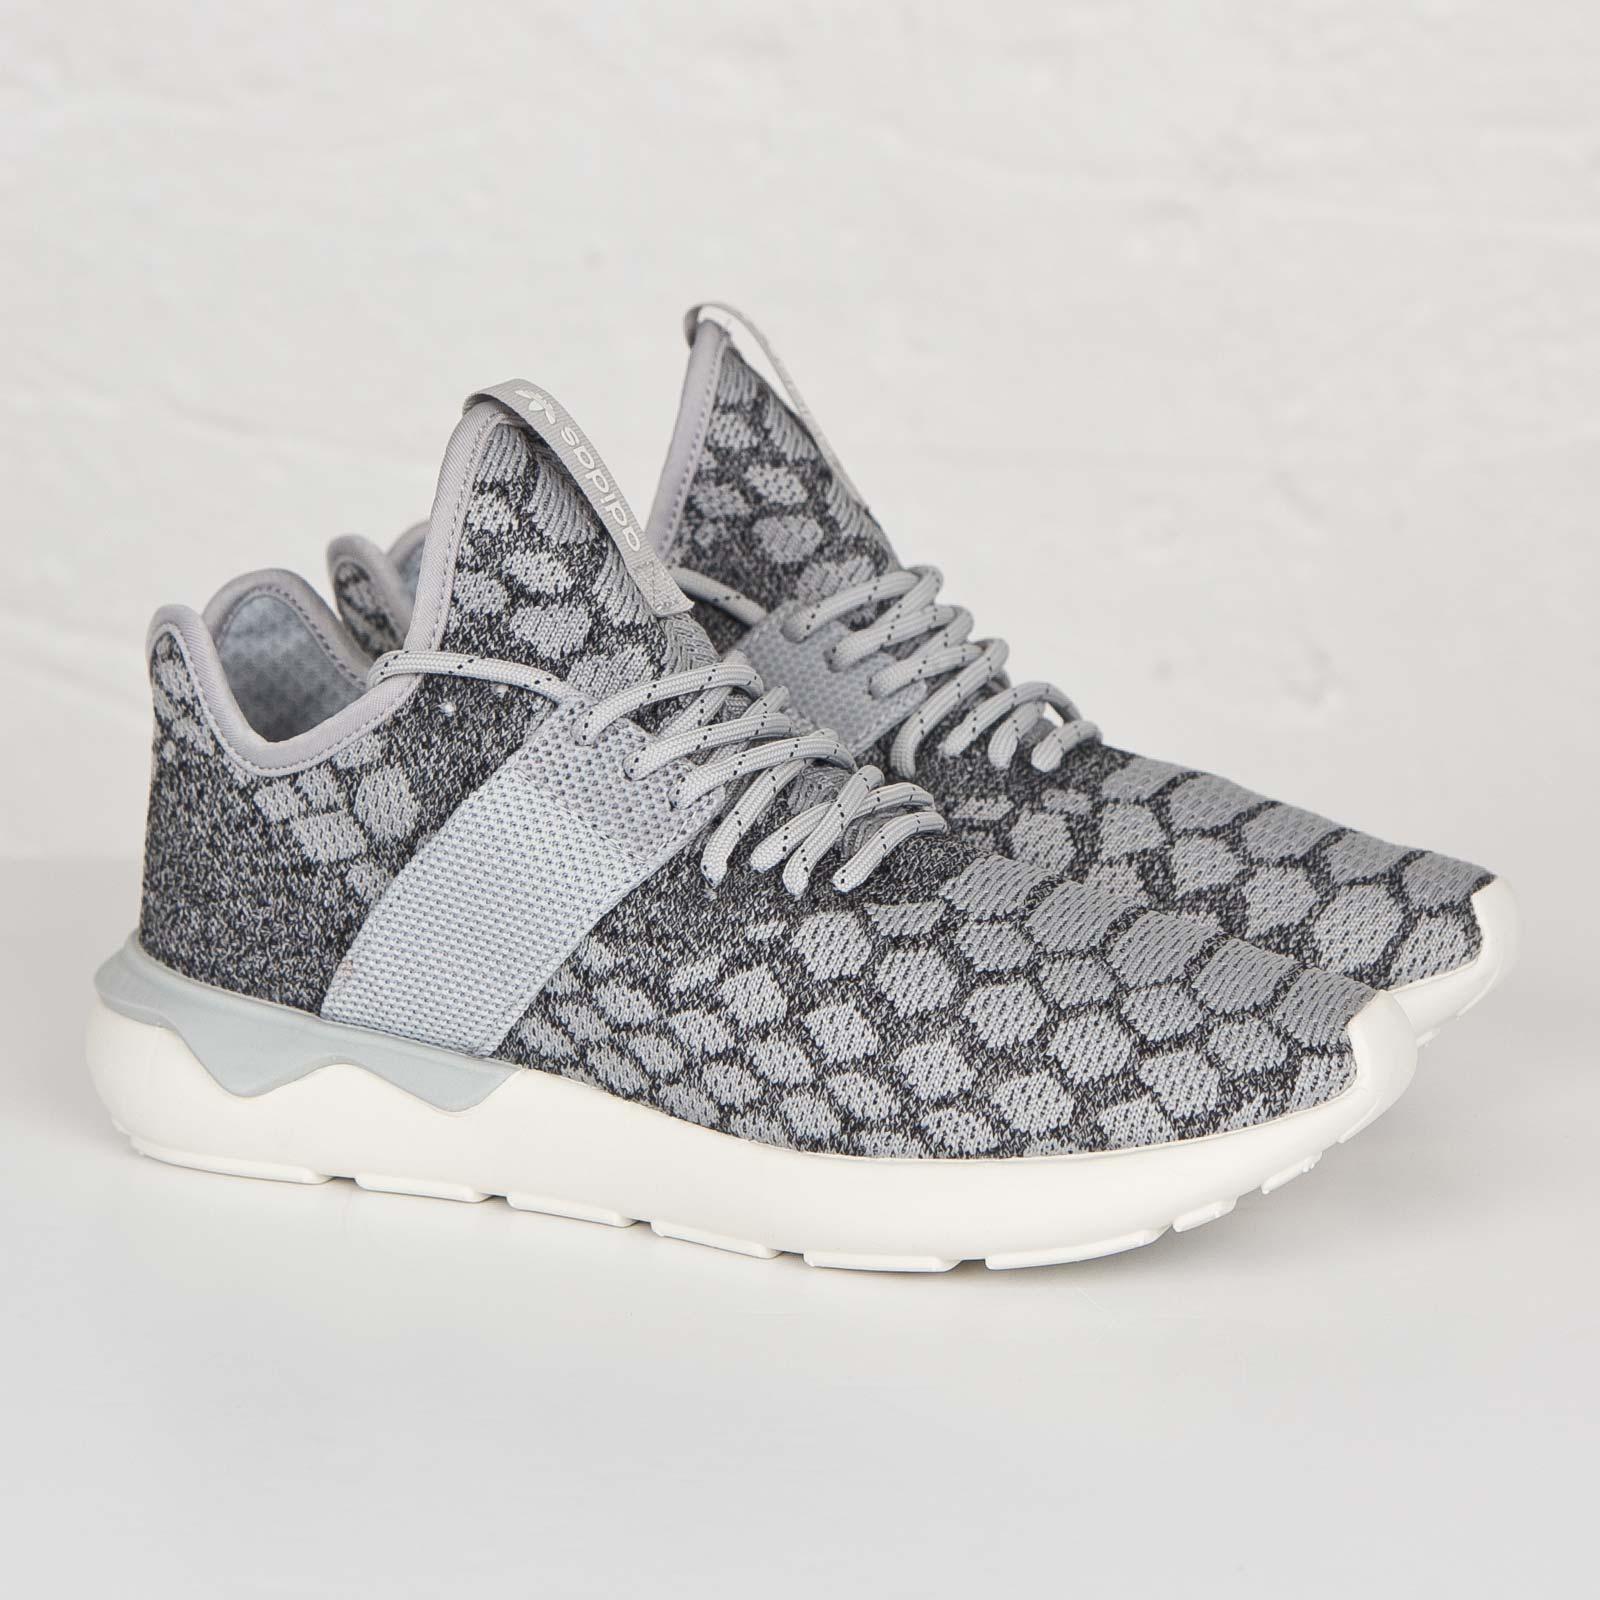 Corredor de tubular primeknit b25571 sneakersnstuff zapatillas adidas